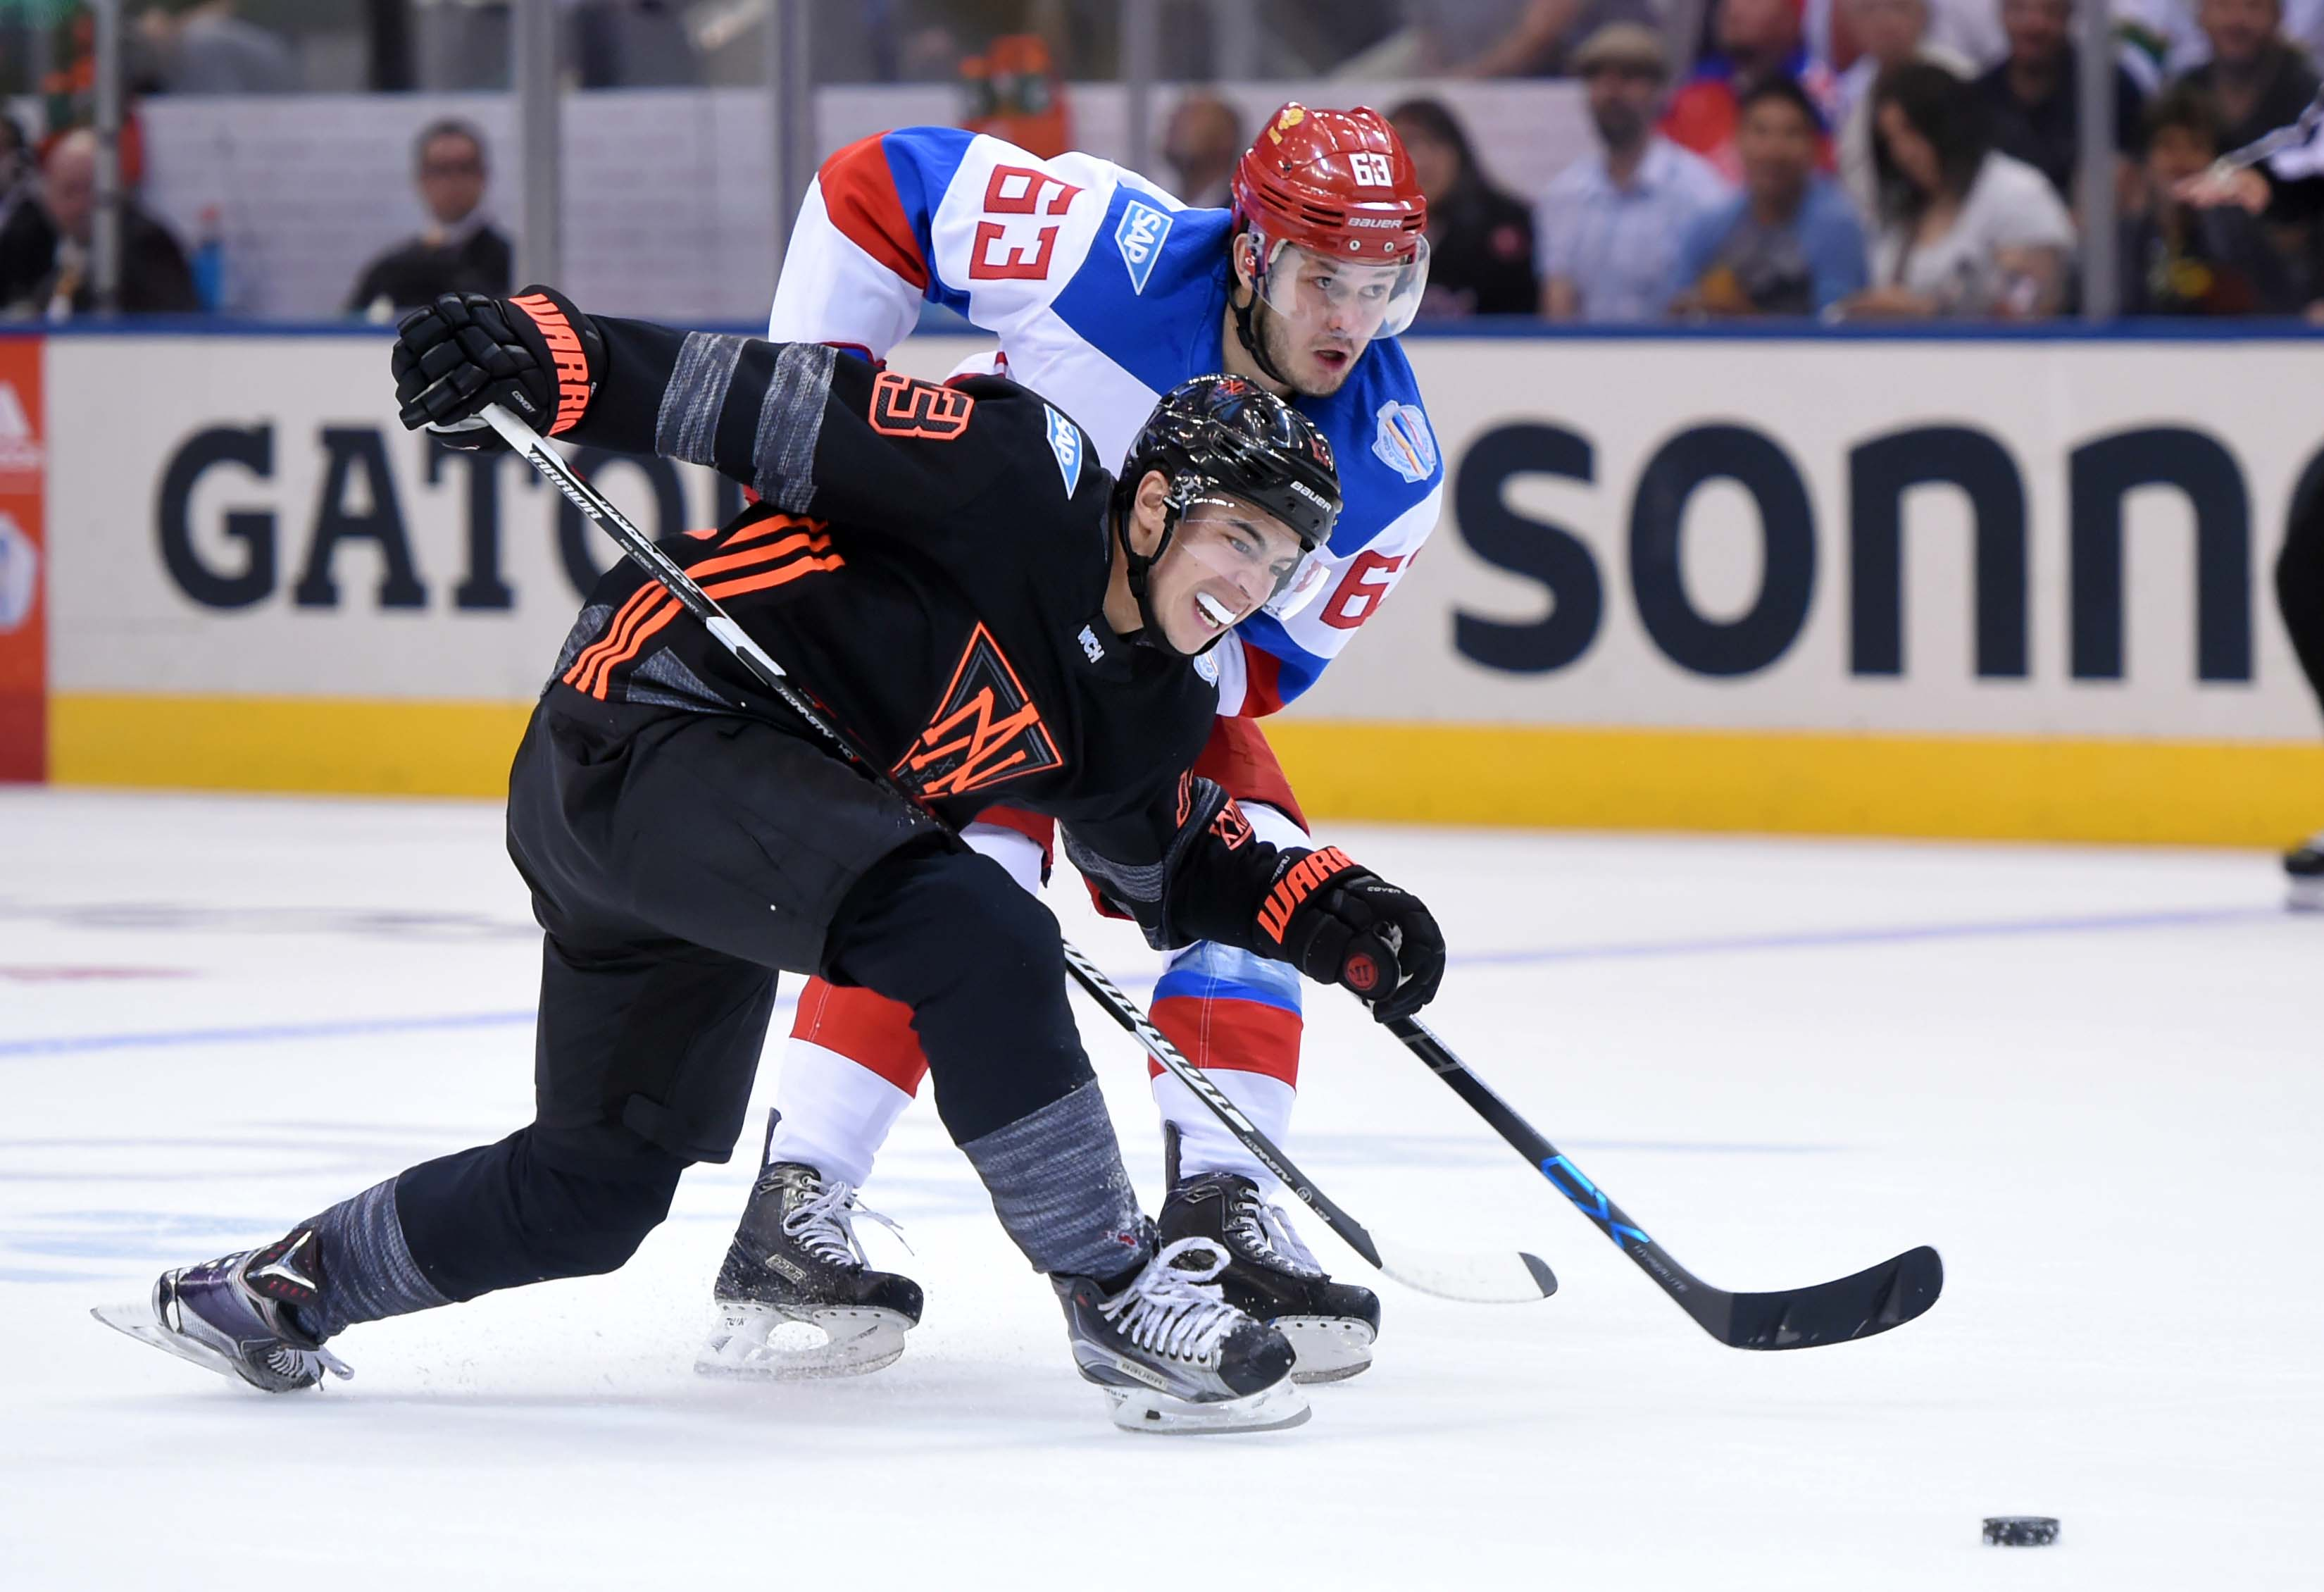 9553825-hockey-world-cup-of-hockey-team-north-america-vs-team-russia